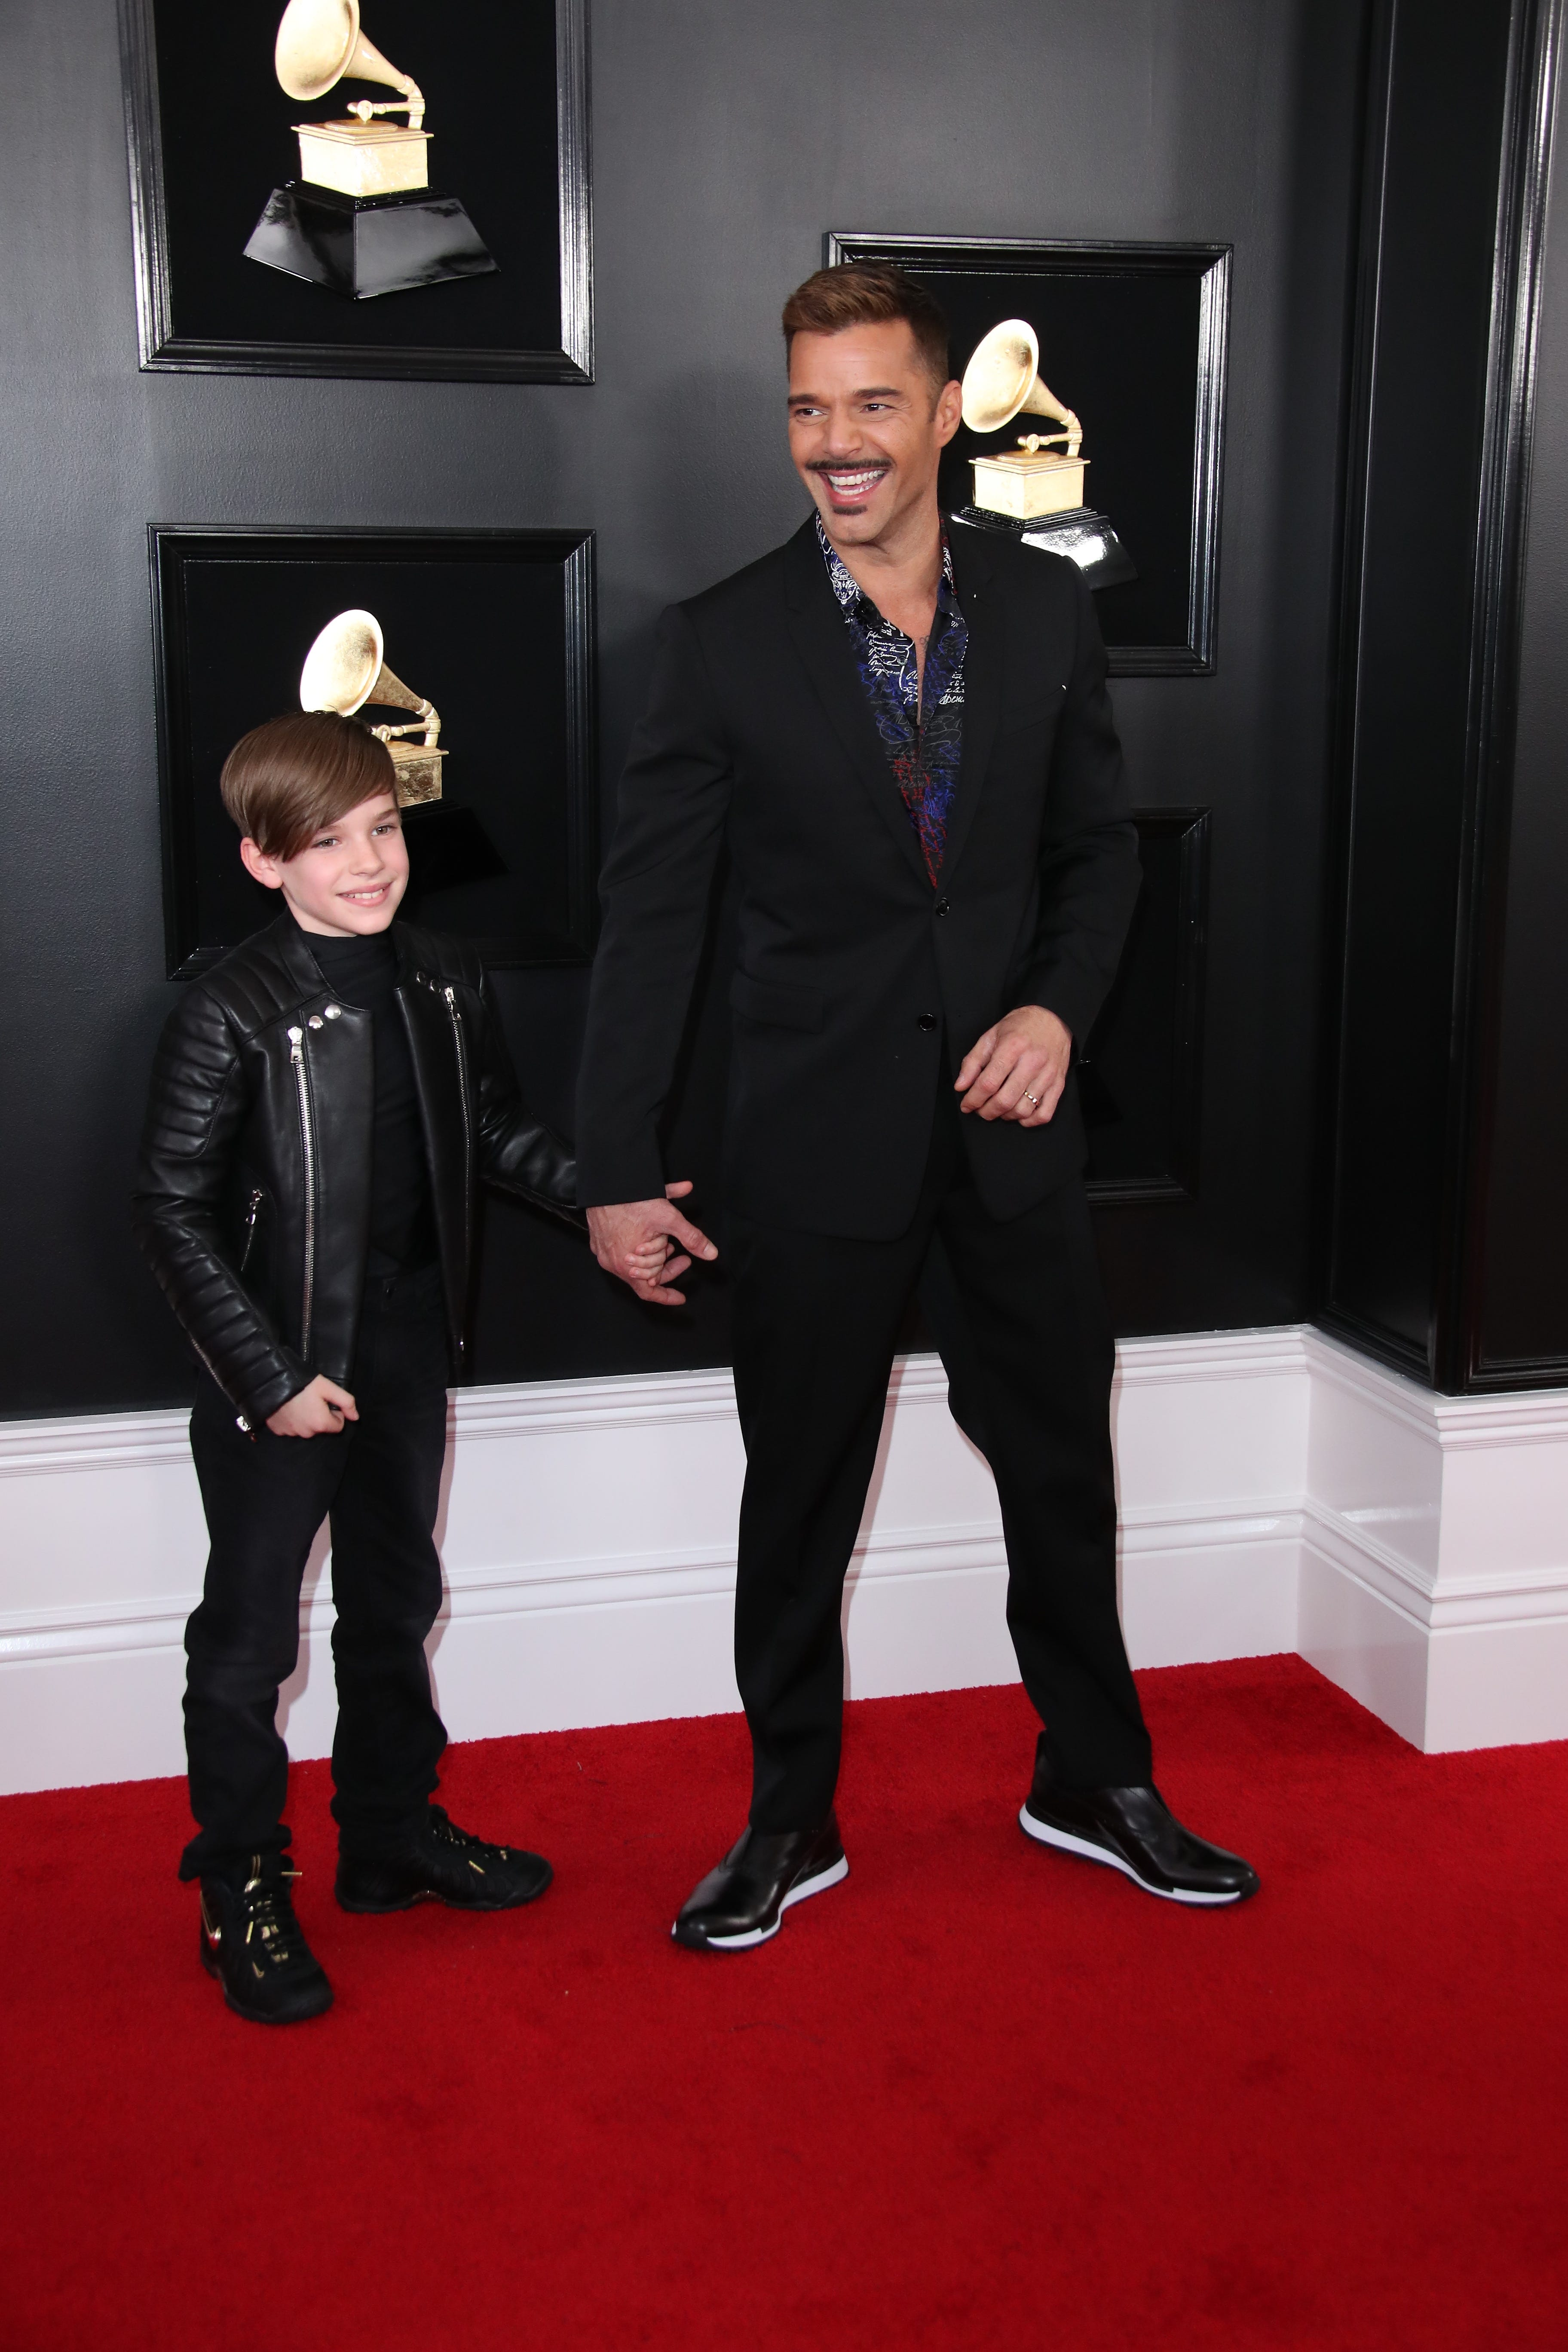 Matteo Martin and Ricky Martin